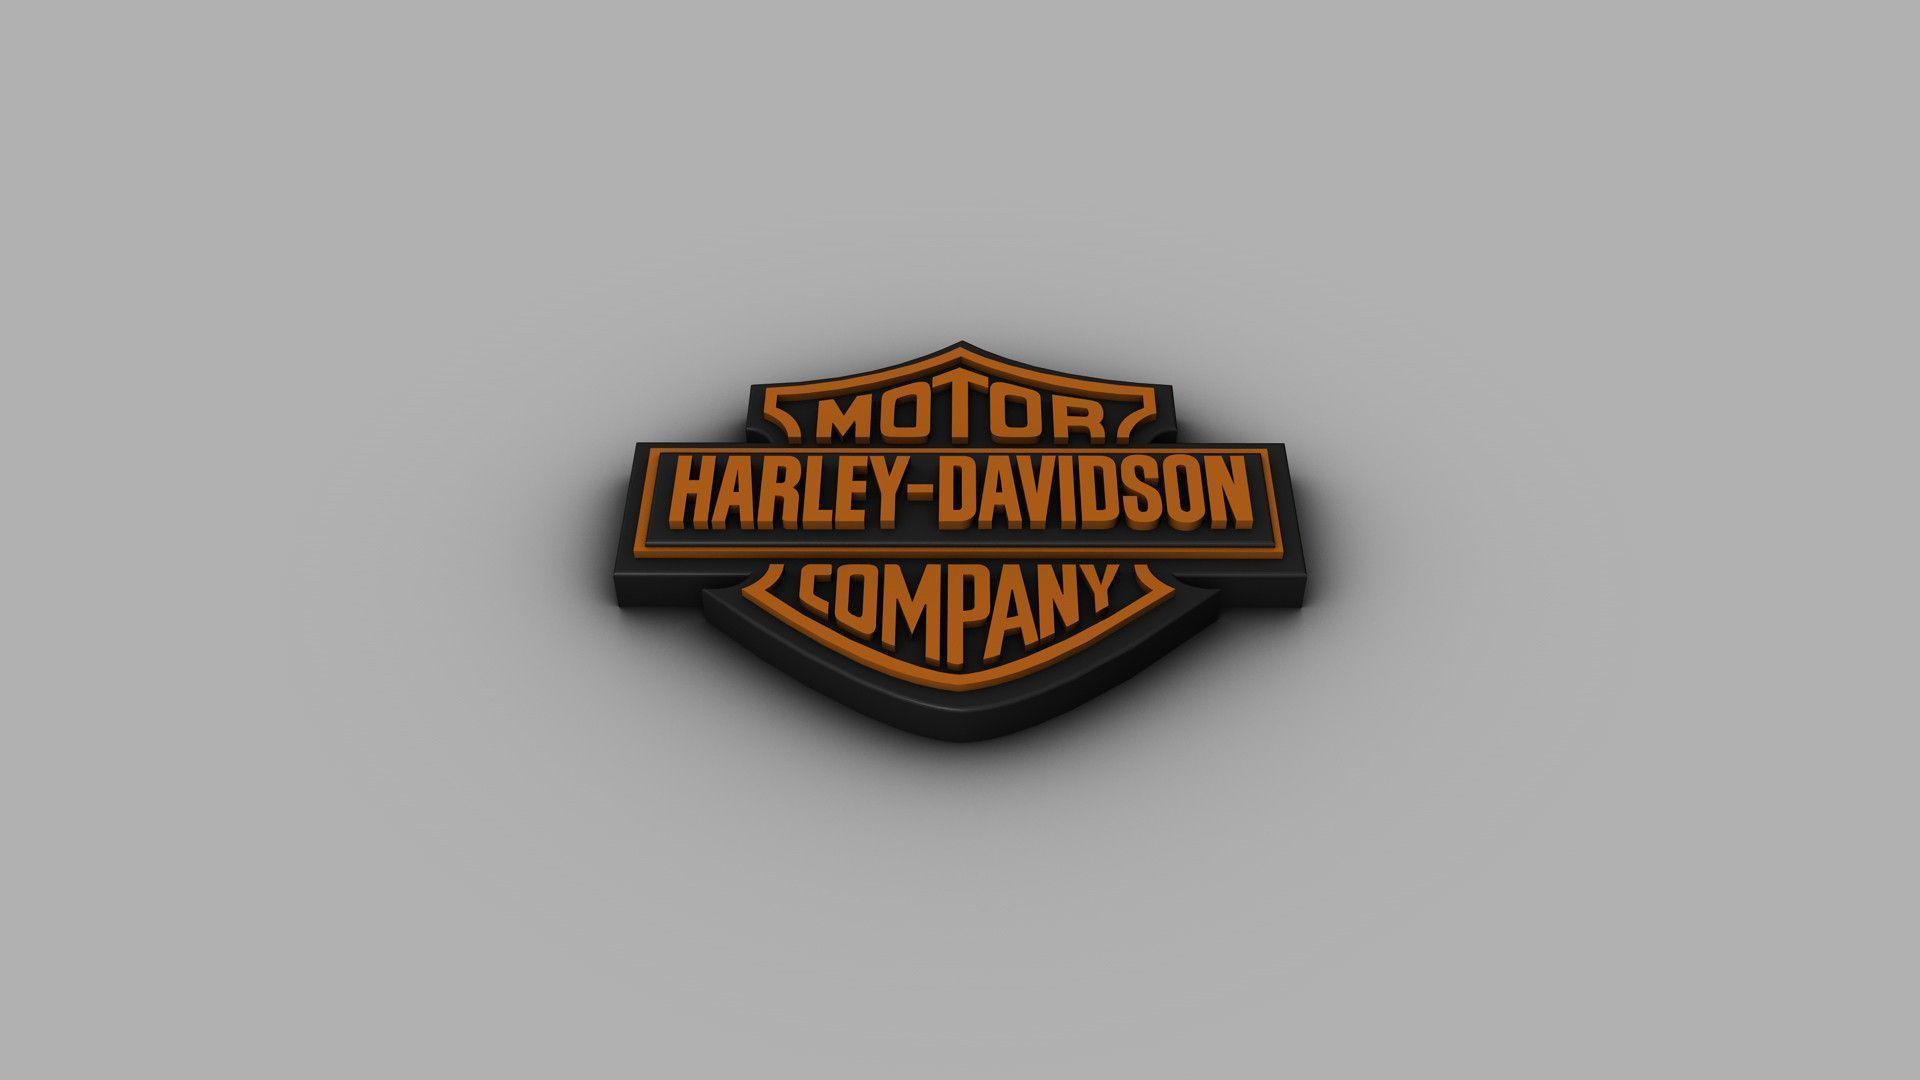 Harley davidson logo wallpapers wallpaper cave for Harley davidson motor co